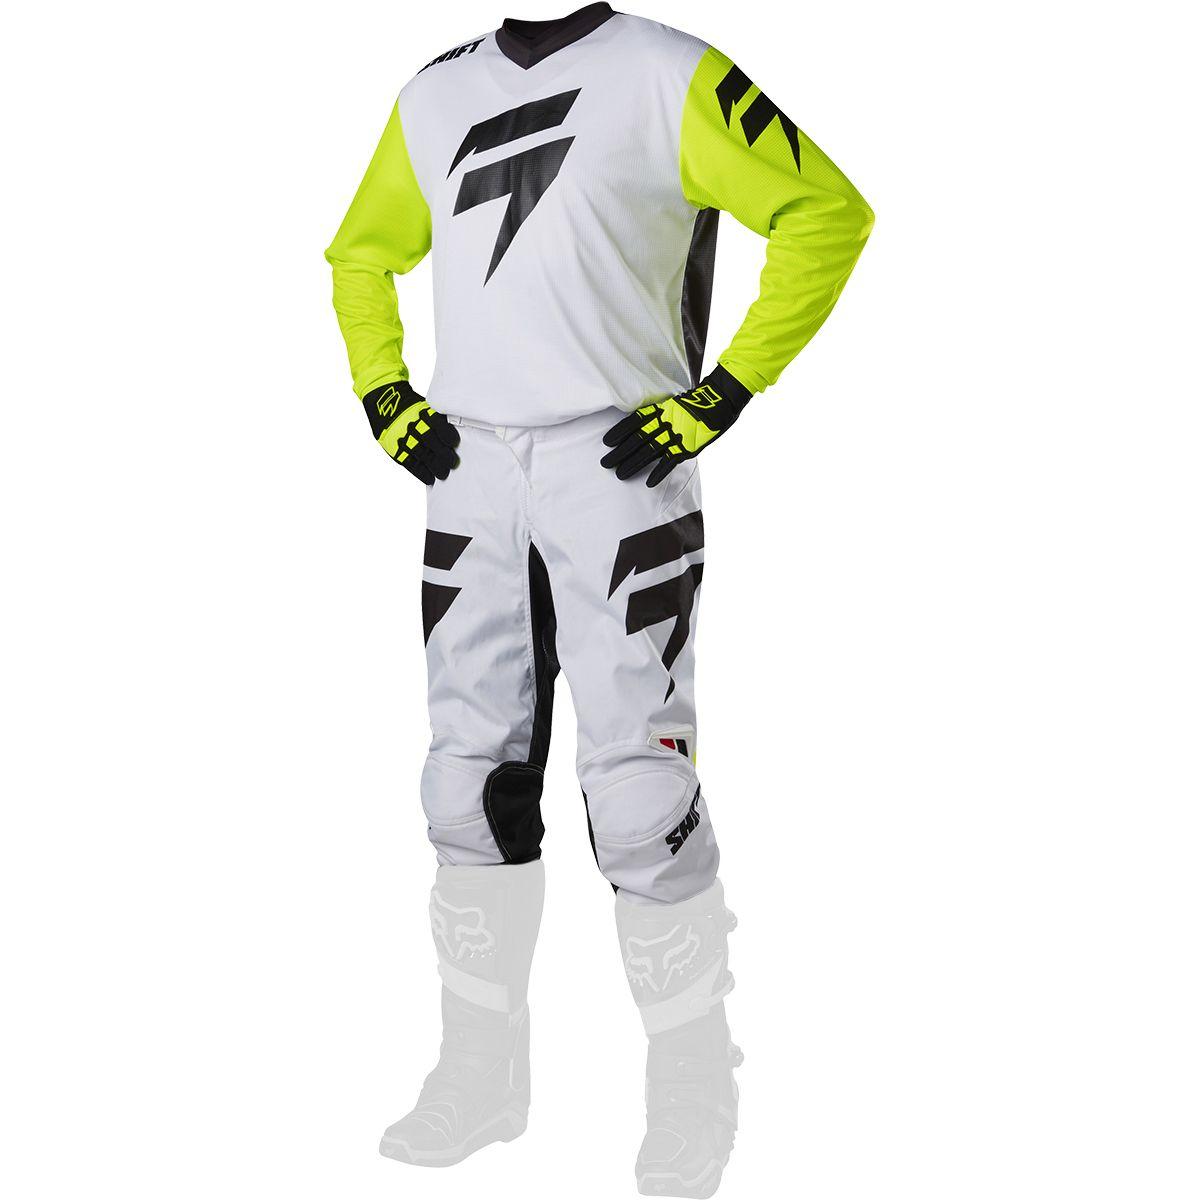 Shift - 2017 WHIT3 Ninety Seven комплект штаны и джерси, белые